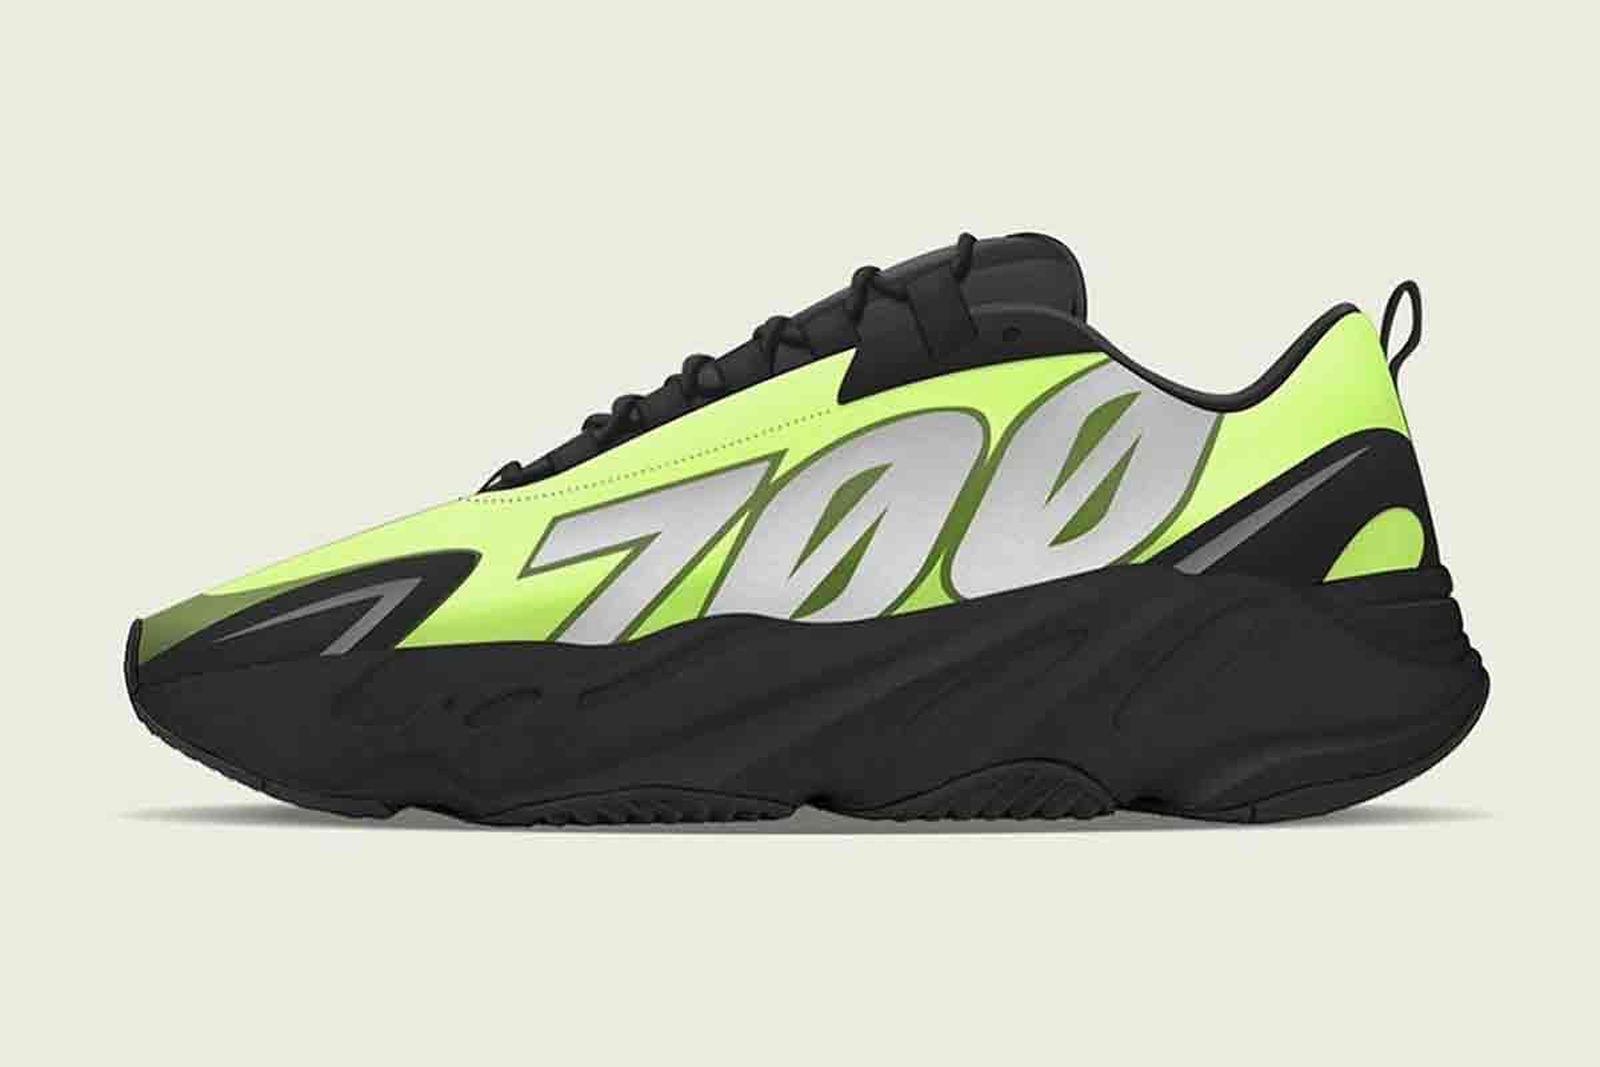 adidas-yeezy-boost-700-mnvn-phosphor-release-date-price-01